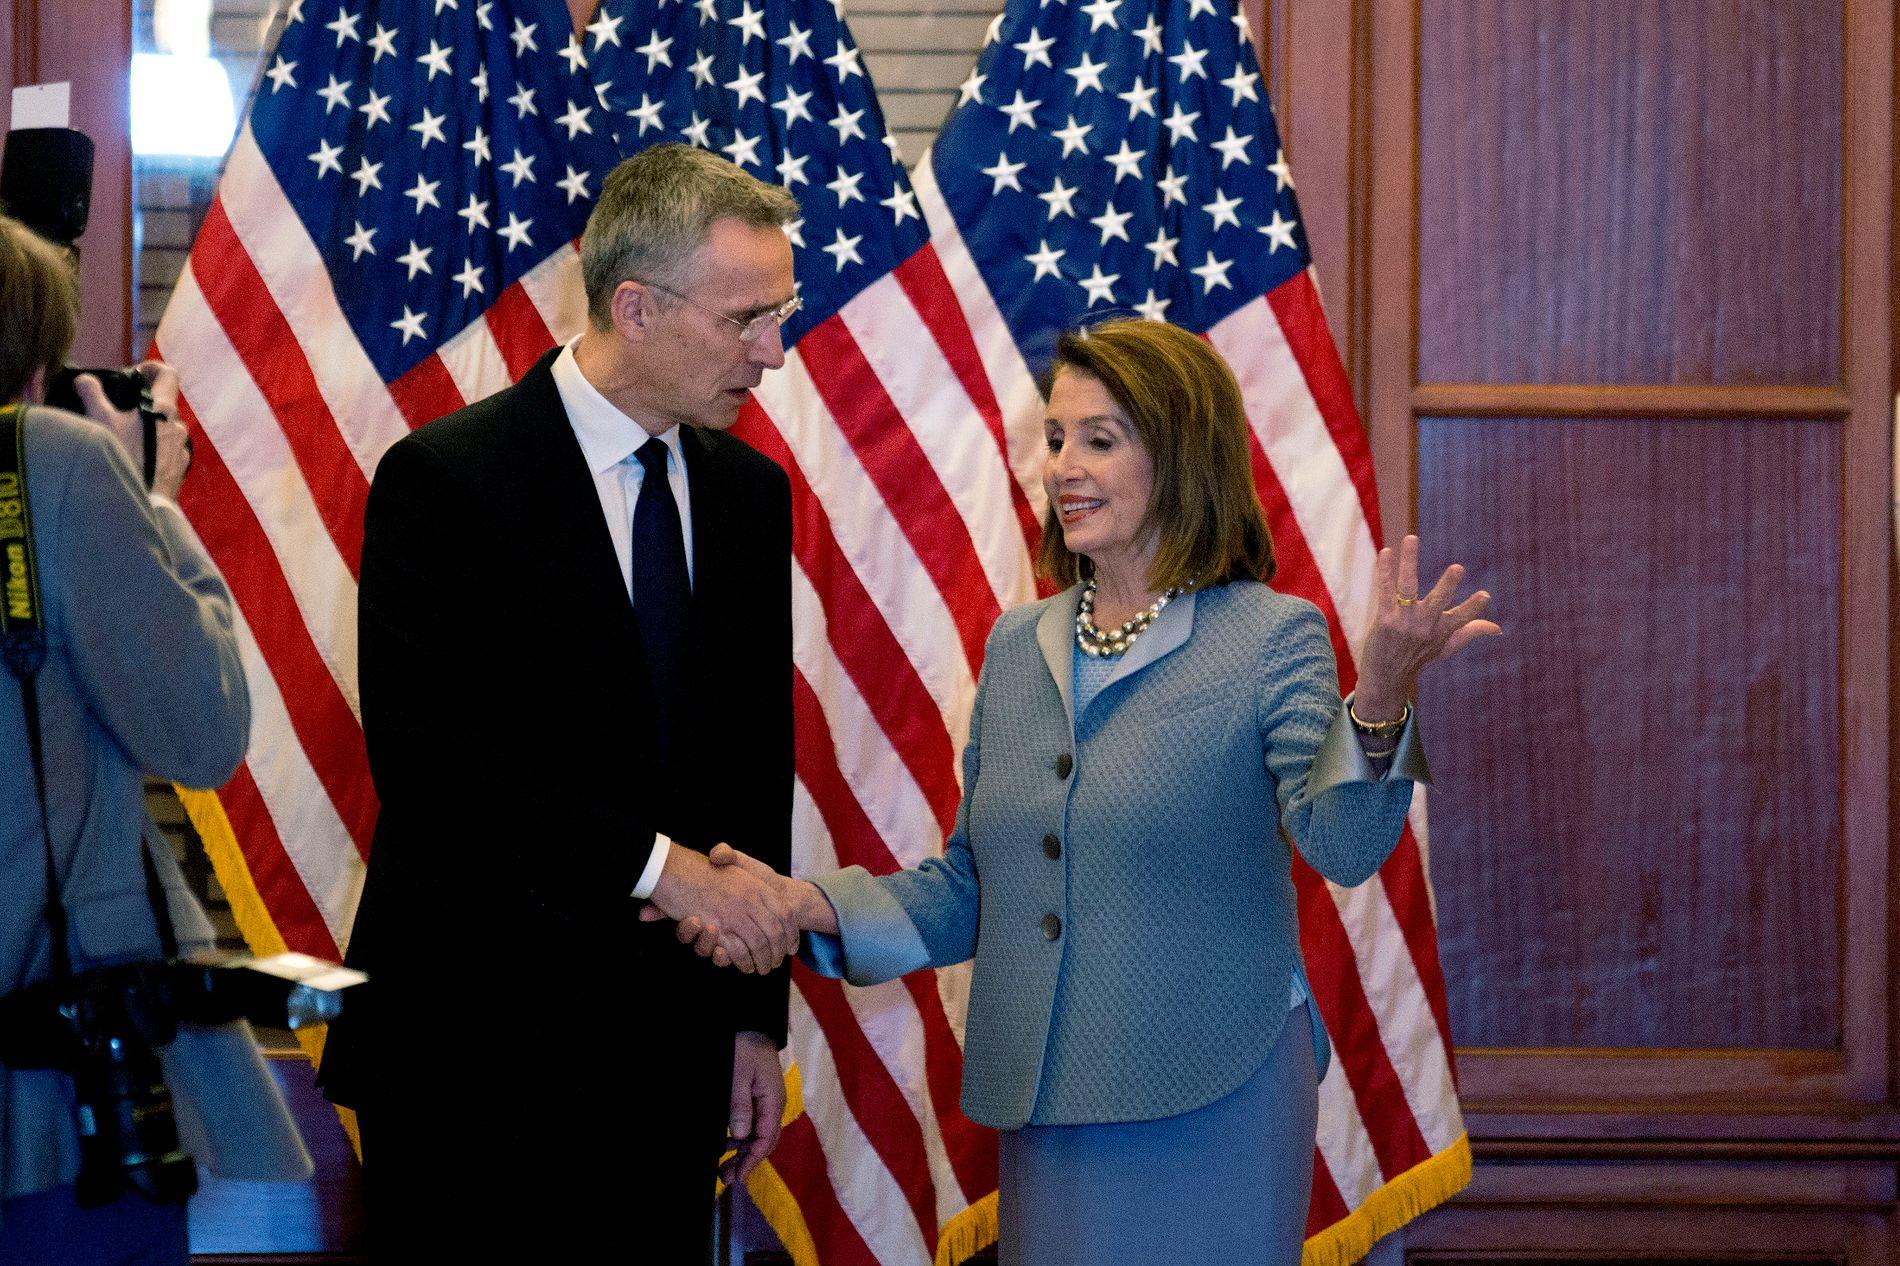 TAKKET PELOSI: Jens Stoltenberg møtte Nancy Pelosi før han holdt sin historiske tale i Kongressen.